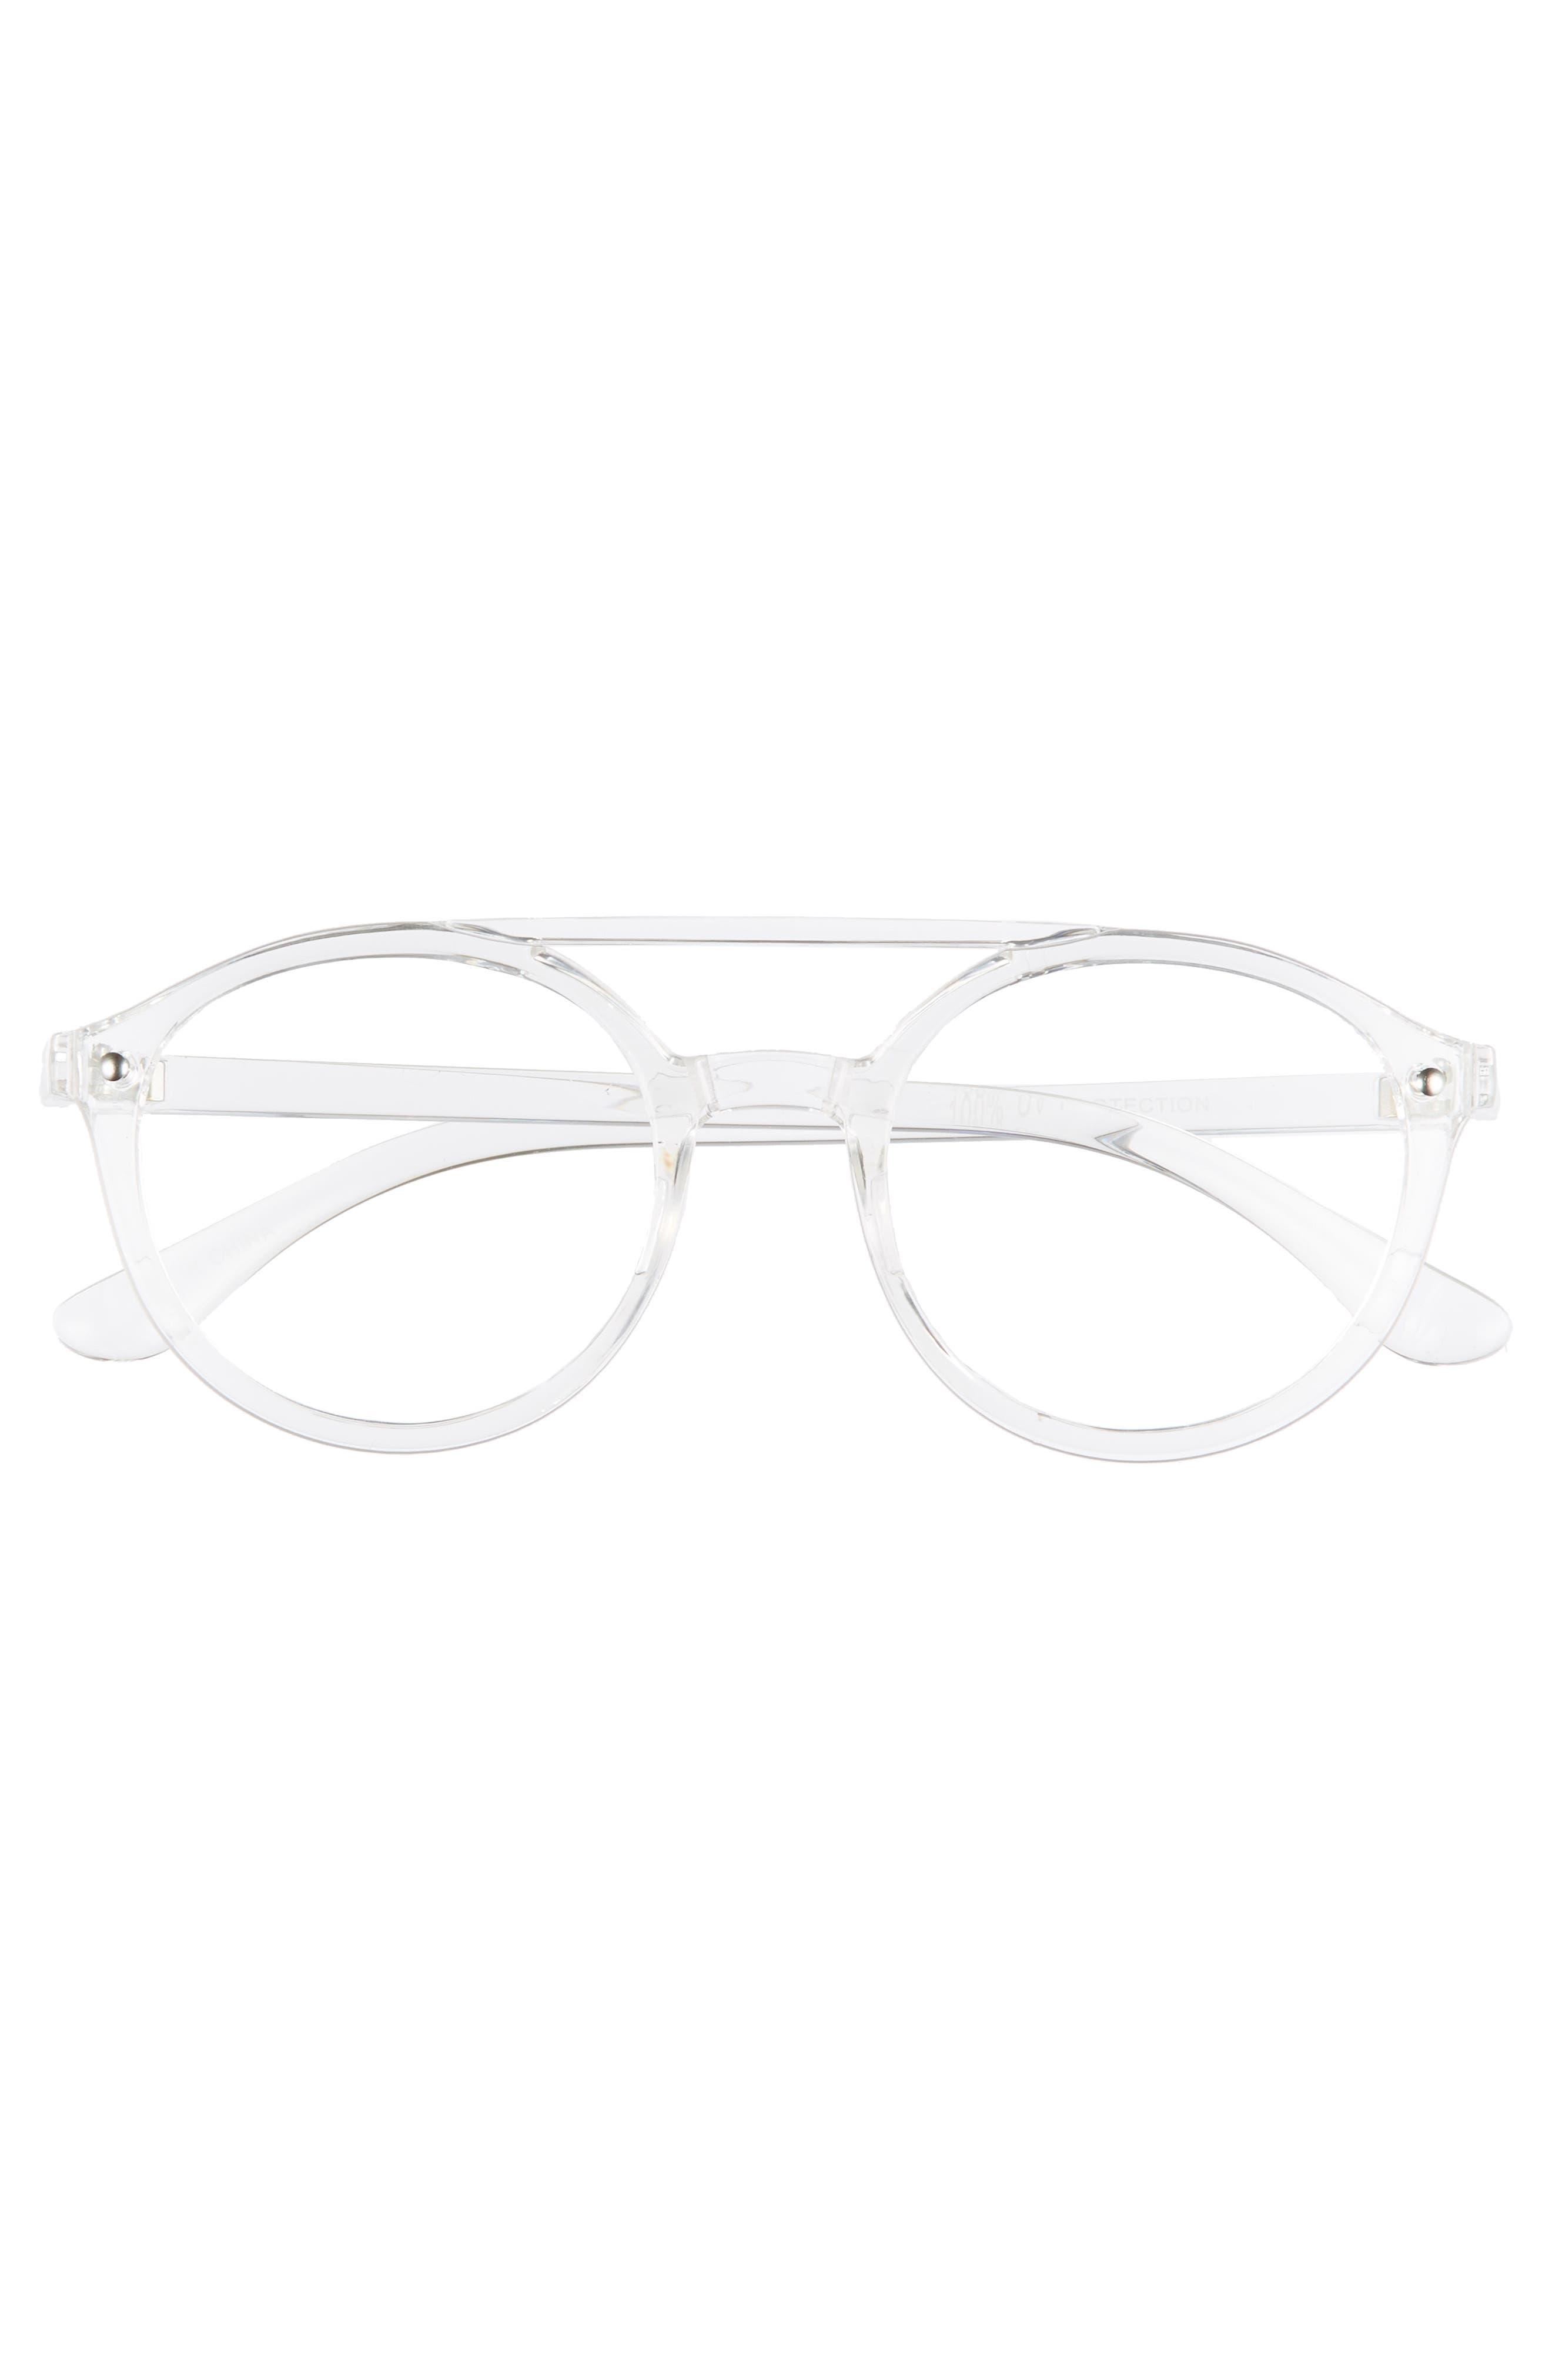 54mm Aviator Fashion Glasses,                             Alternate thumbnail 3, color,                             CLEAR